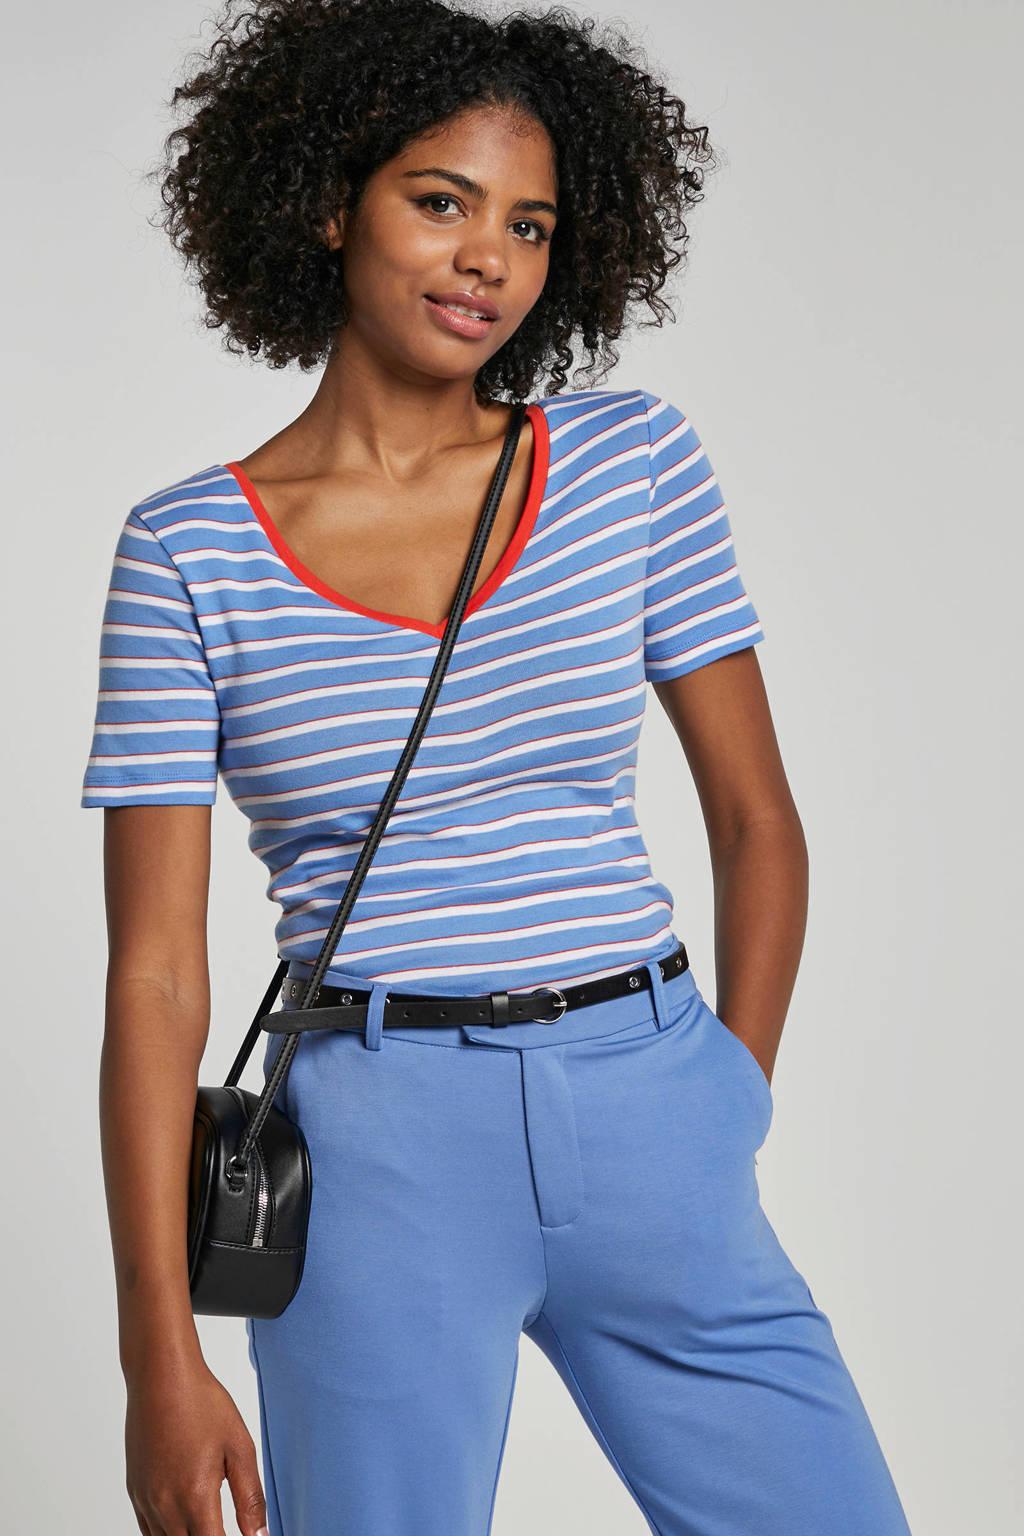 Tom Tailor gestreept T-shirt met V-hals, Blauw/rood/wit